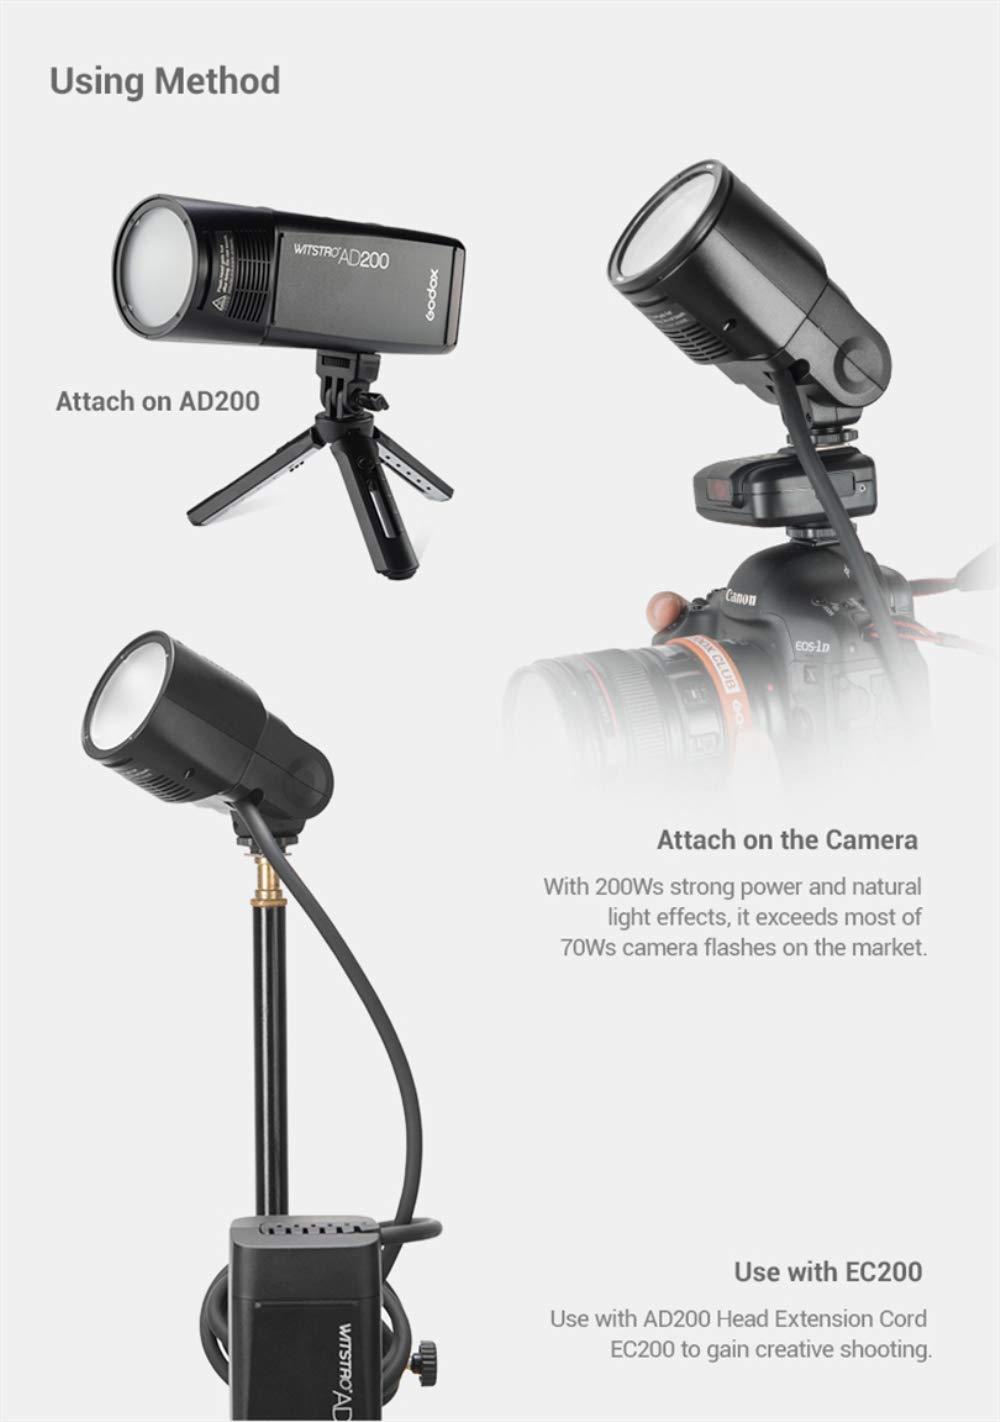 Godox AD200 Pocket Flash and H200R Ring Flash Head Set, 200Ws 2.4G TTL Strobe Flash 1/8000s HSS Cordless Monolight with 2900mAh Lithium Battery Bare Bulb by Godox (Image #7)